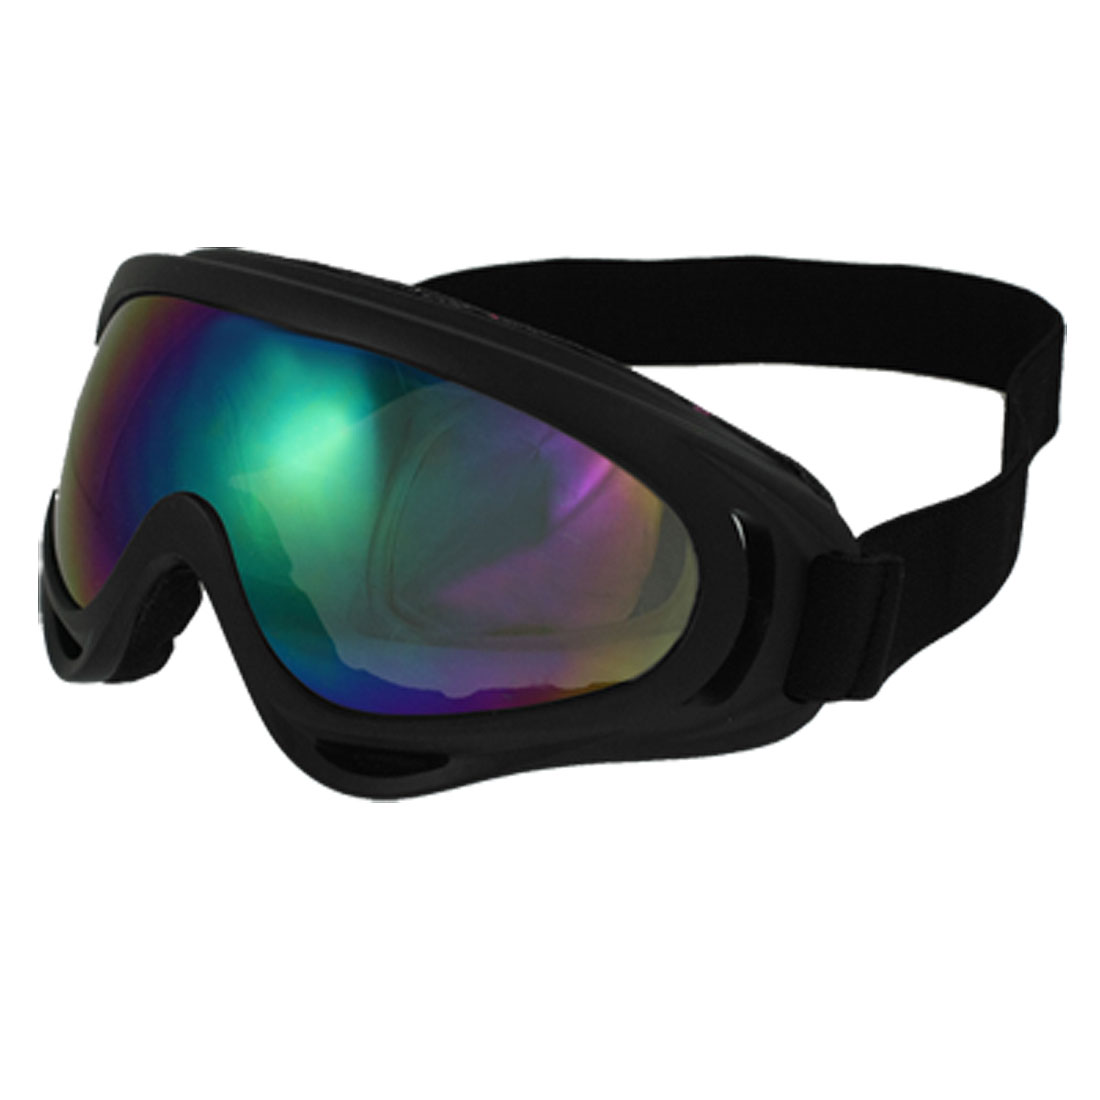 Man Woman Black Plastic Full Frame Colored Lens Wind Sand Ski Goggles Glasses